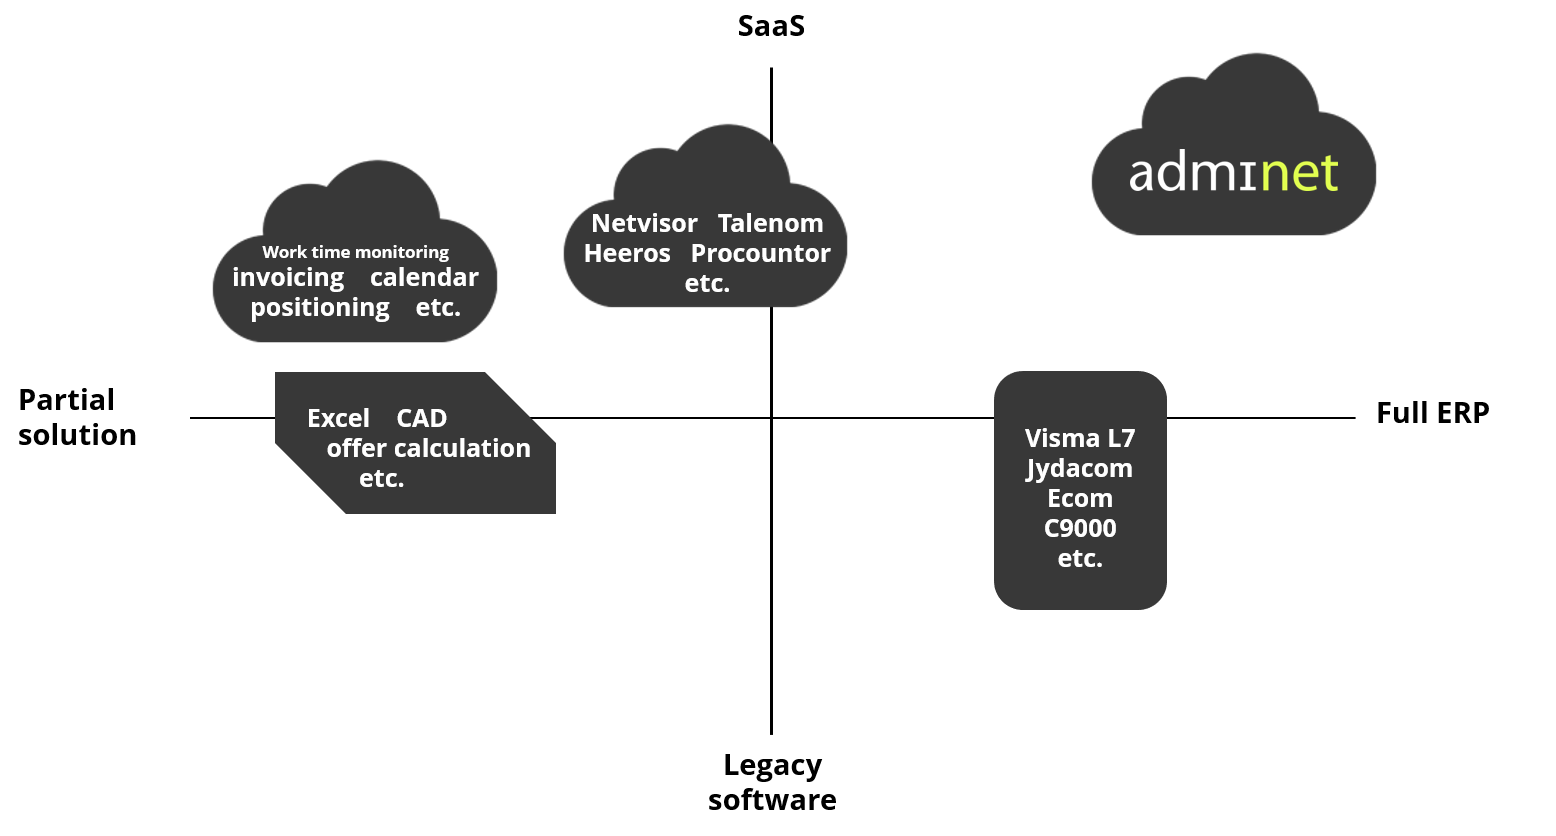 Admicom - competitors 2020